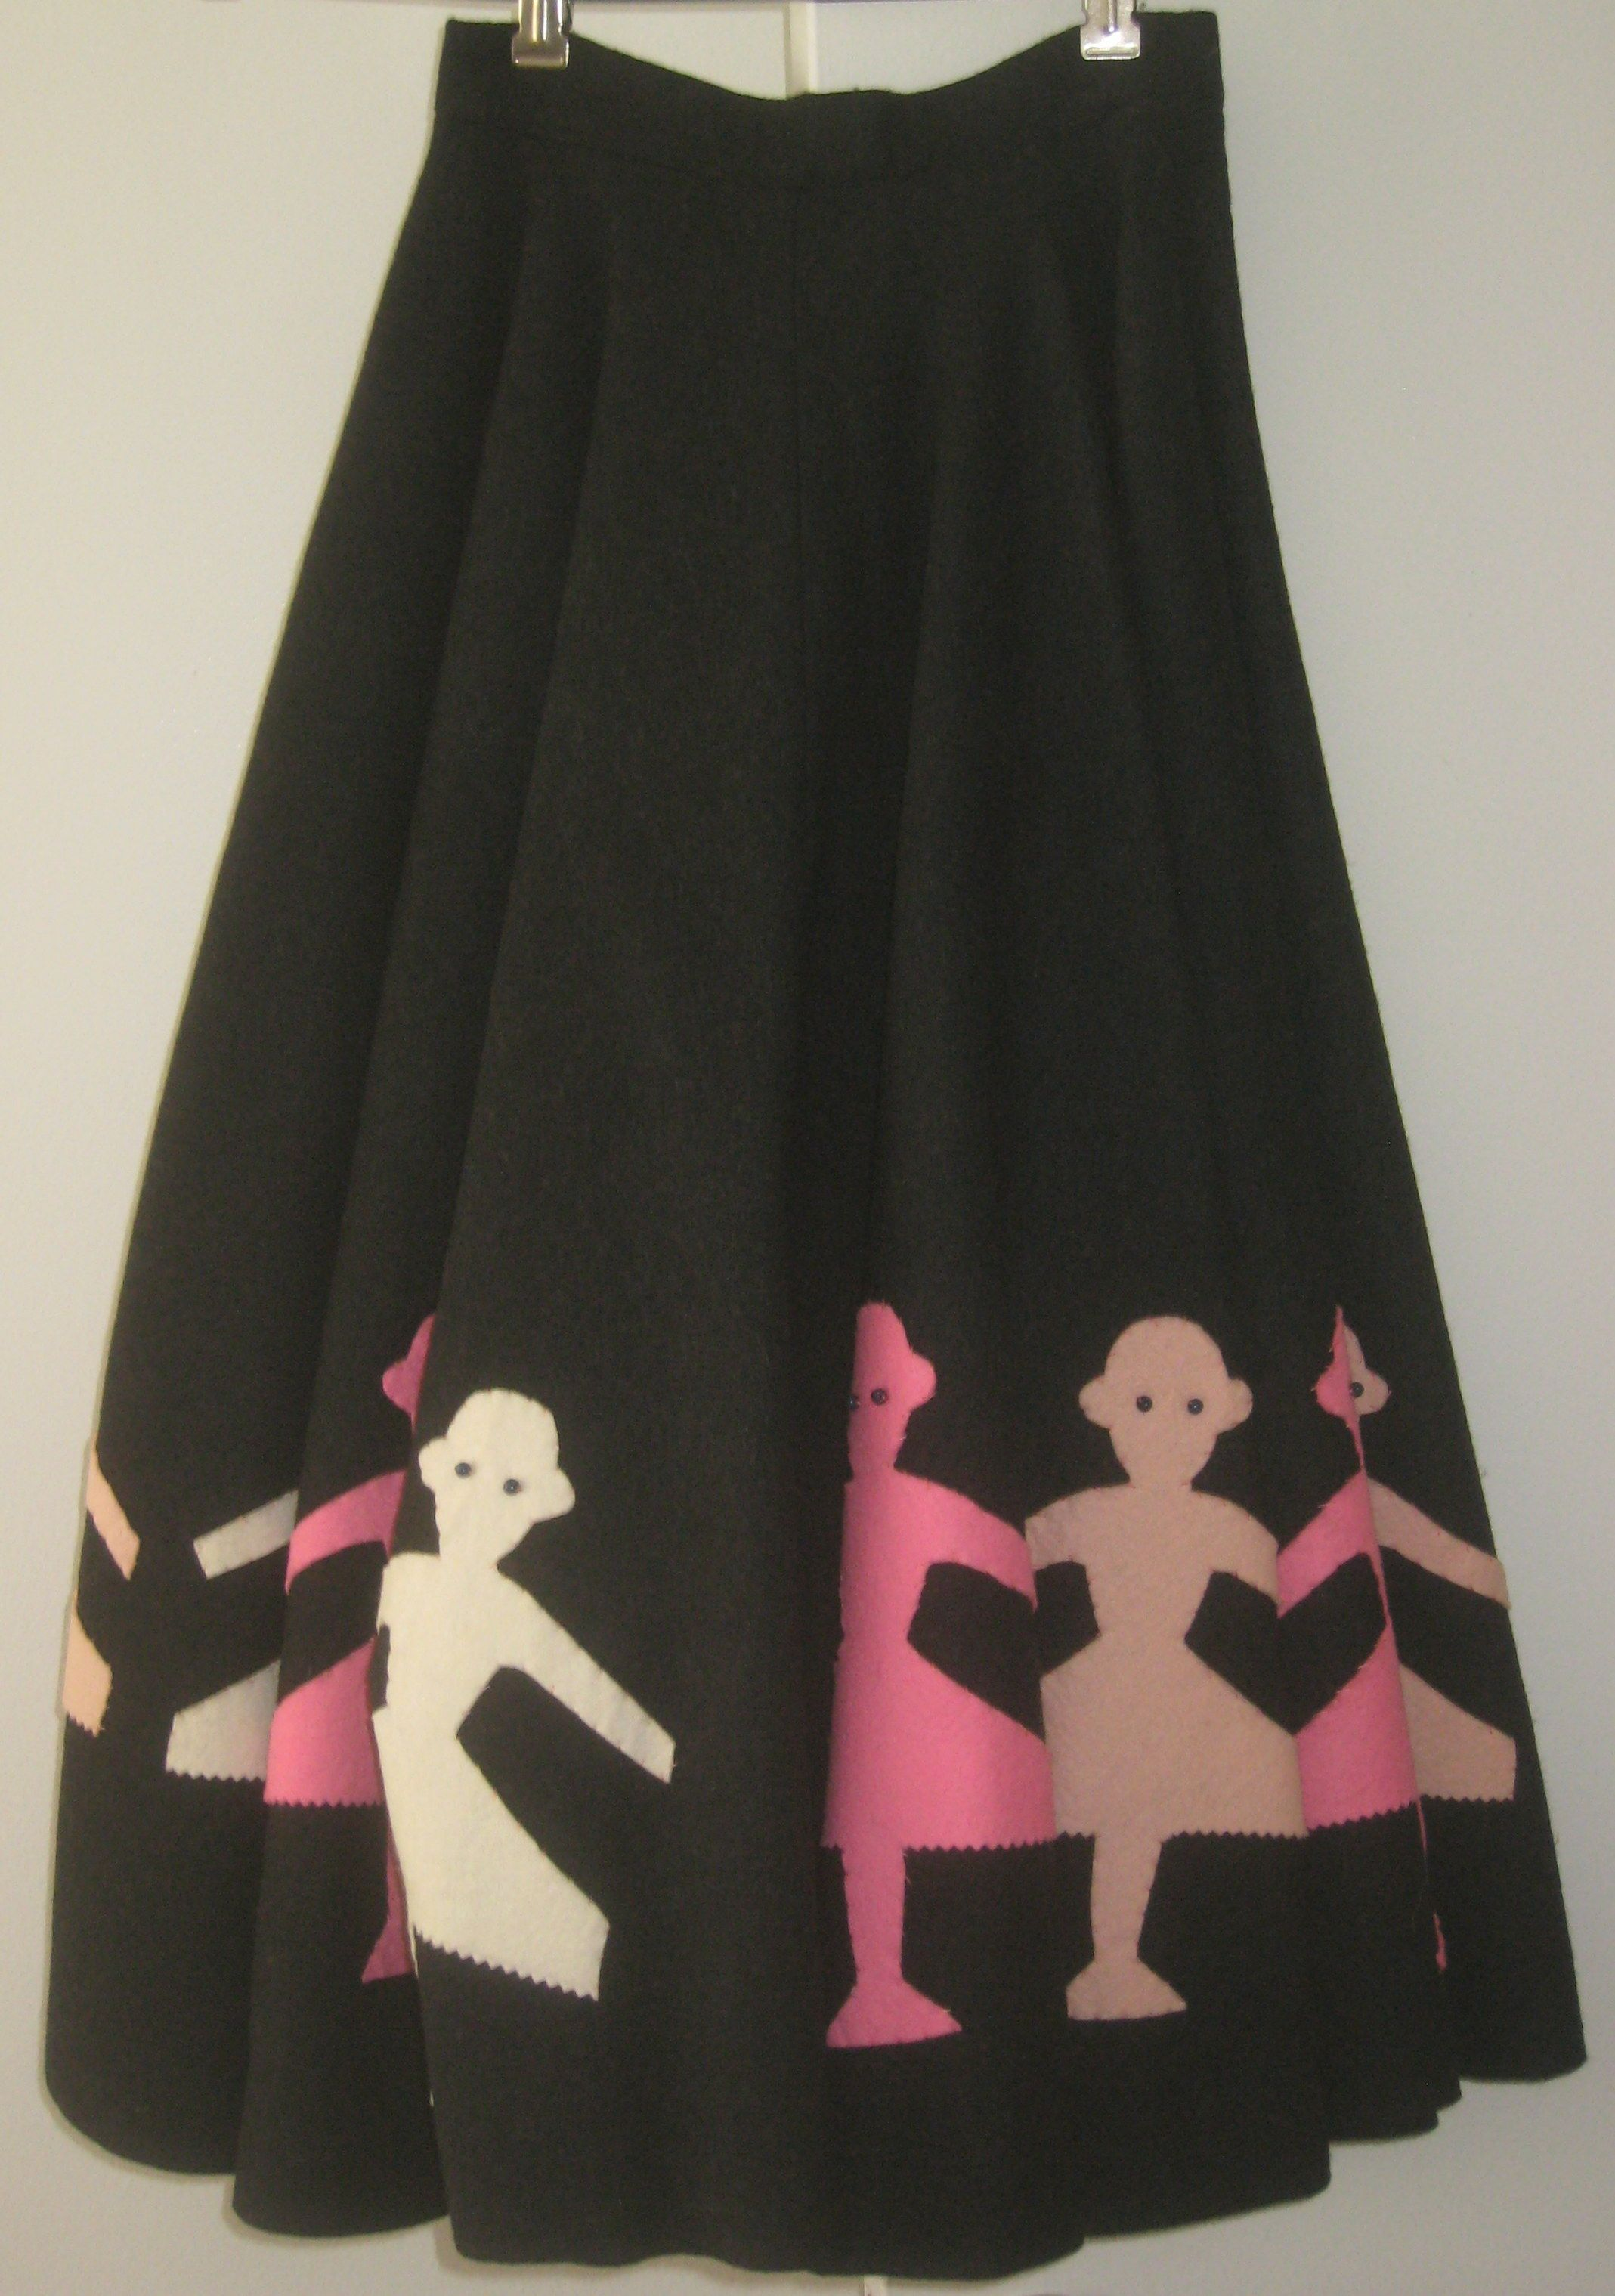 Vintage handmade skirt with applique figures